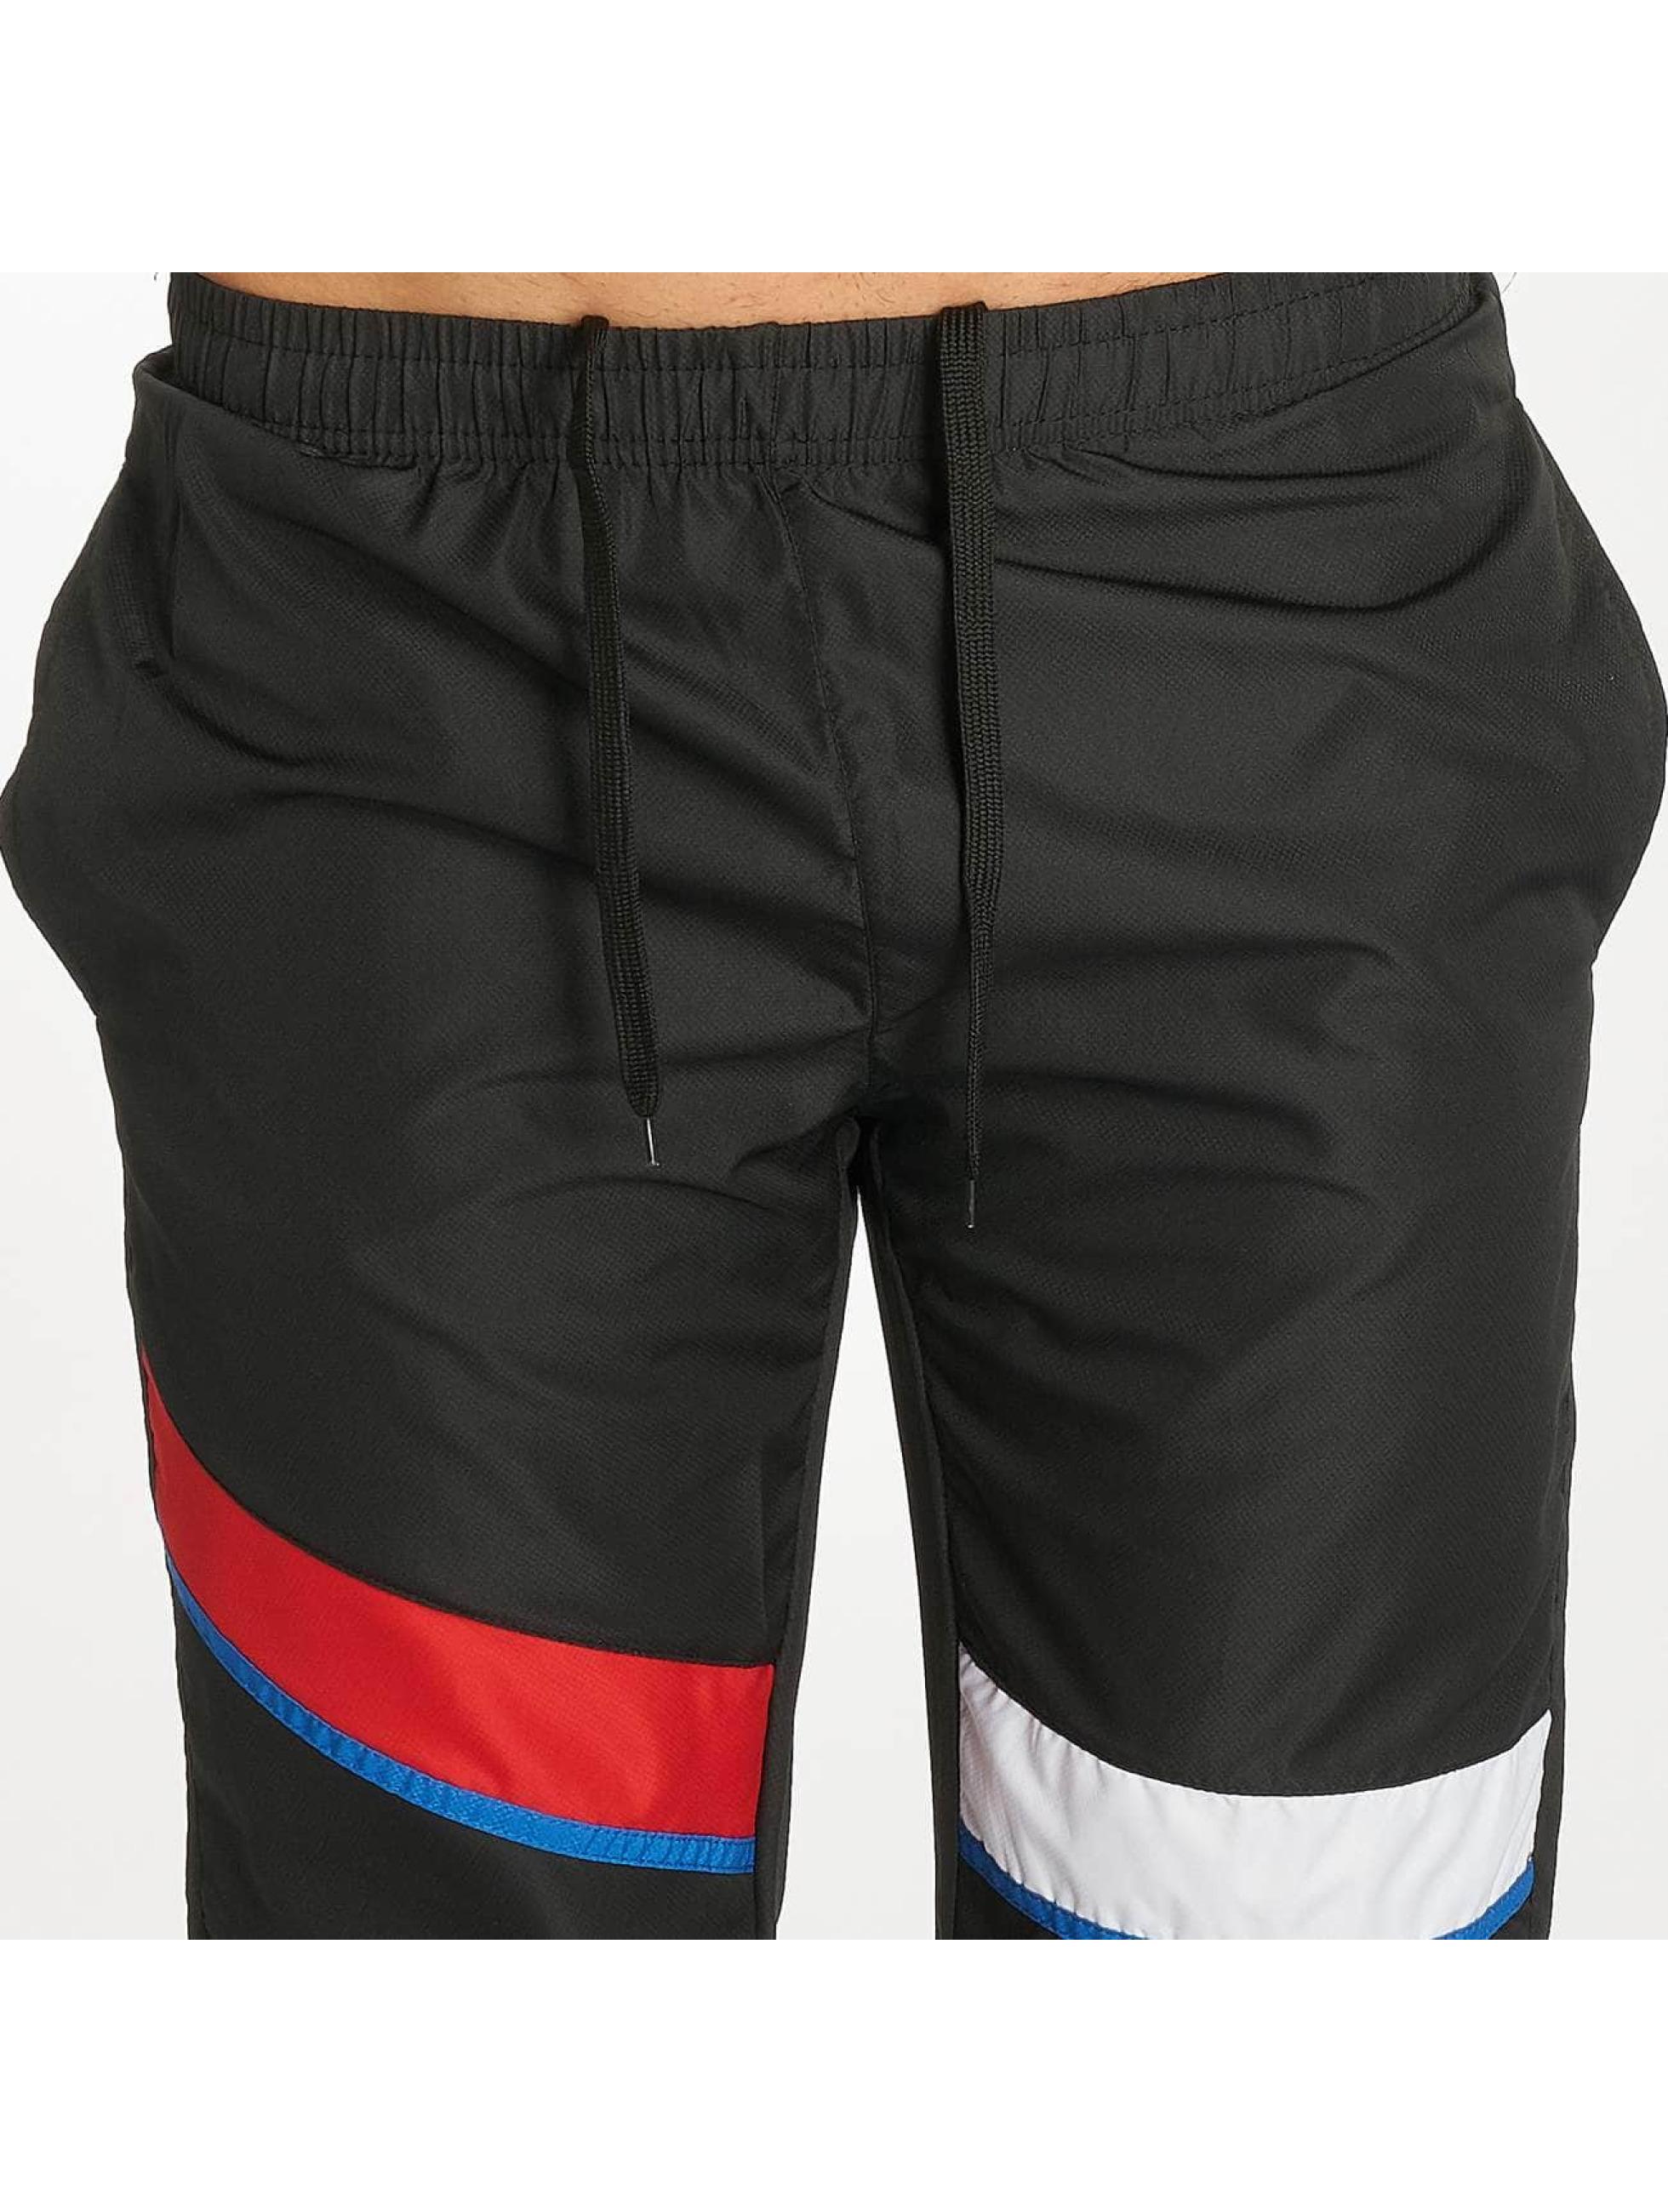 Zayne Paris shorts Stripe zwart